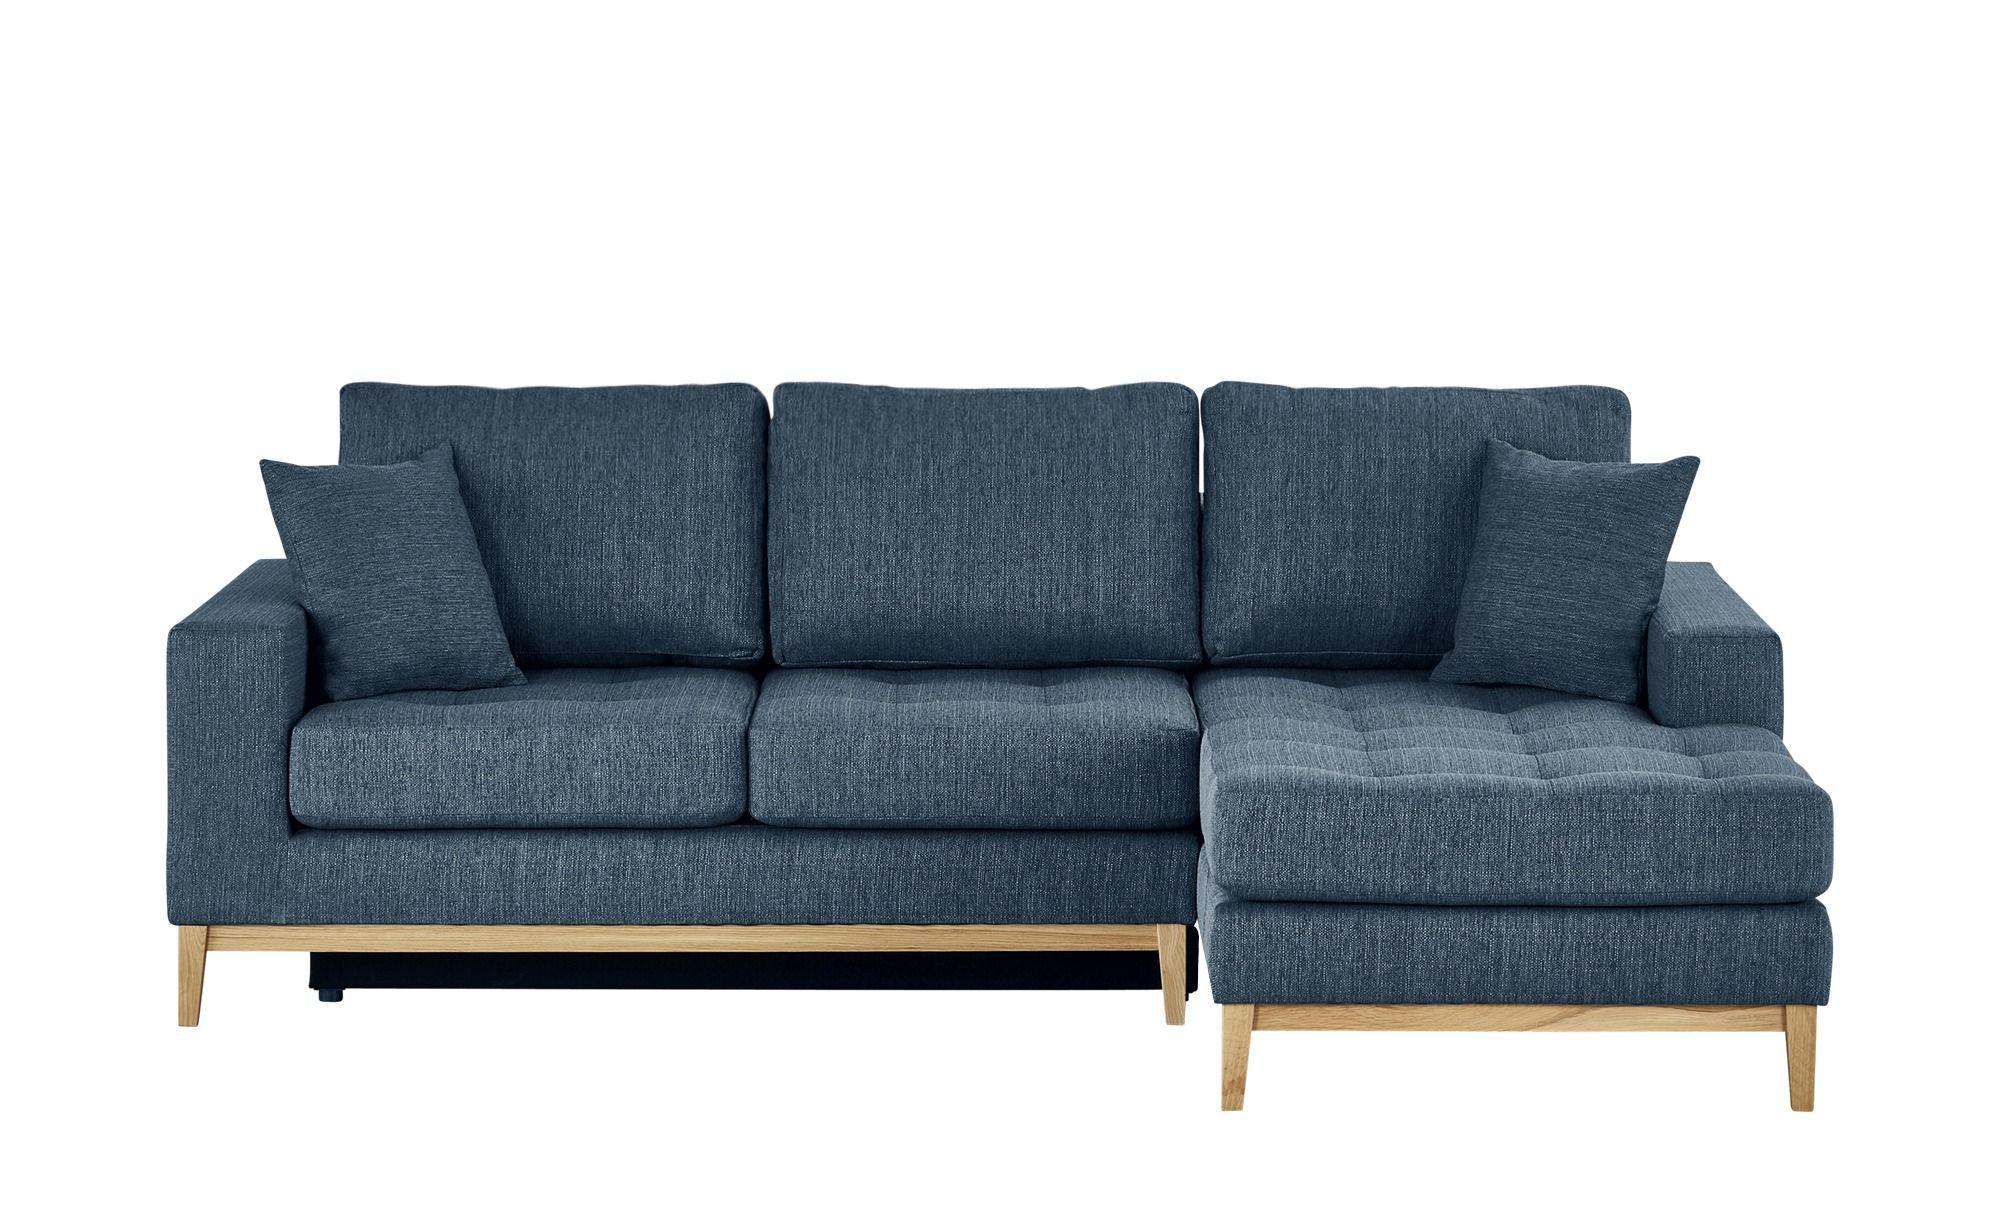 Switch Ecksofa Blau Flachgewebe Tulsa Sofa Big Sofa Kaufen Und Ecksofa